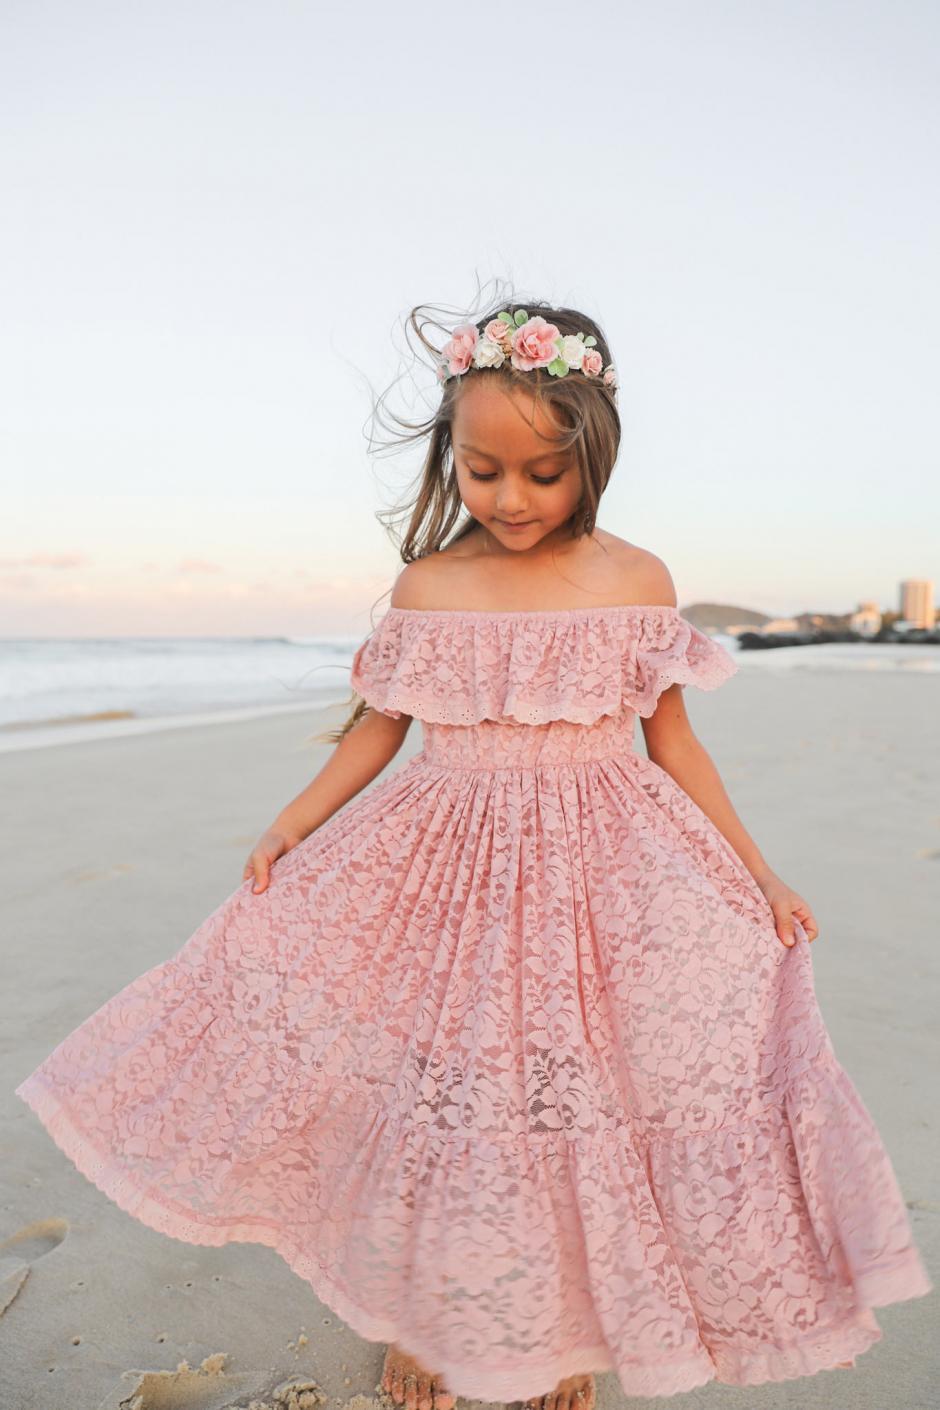 Delphine Dusty Rose Lace Off The Shoulder Dress2